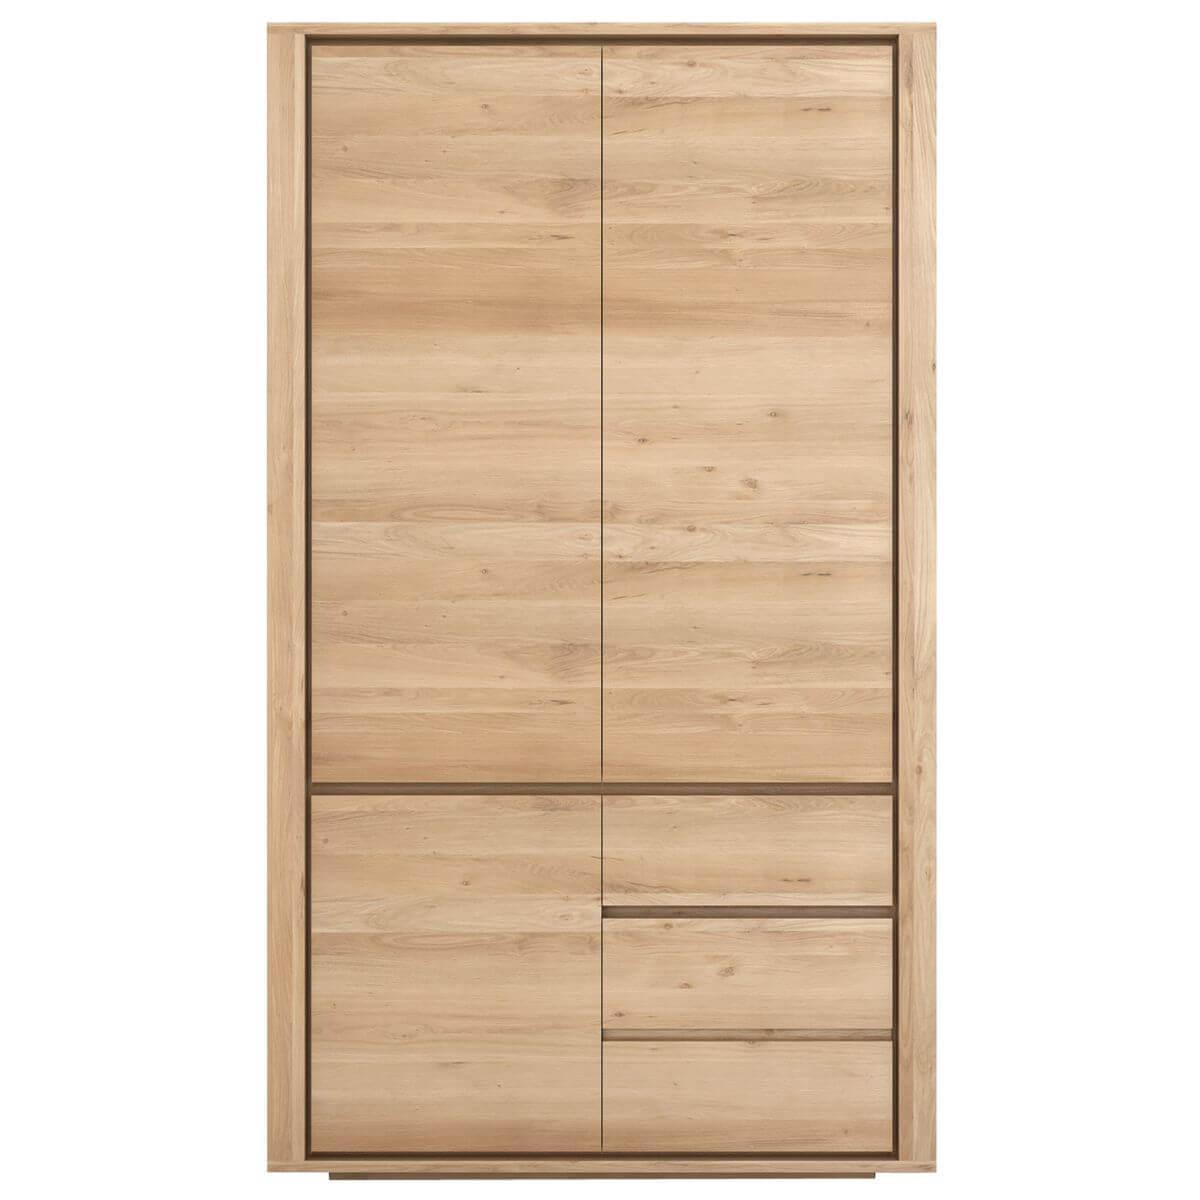 Armoire 3 portes-2 tiroirs SHADOW Ethnicraft chêne